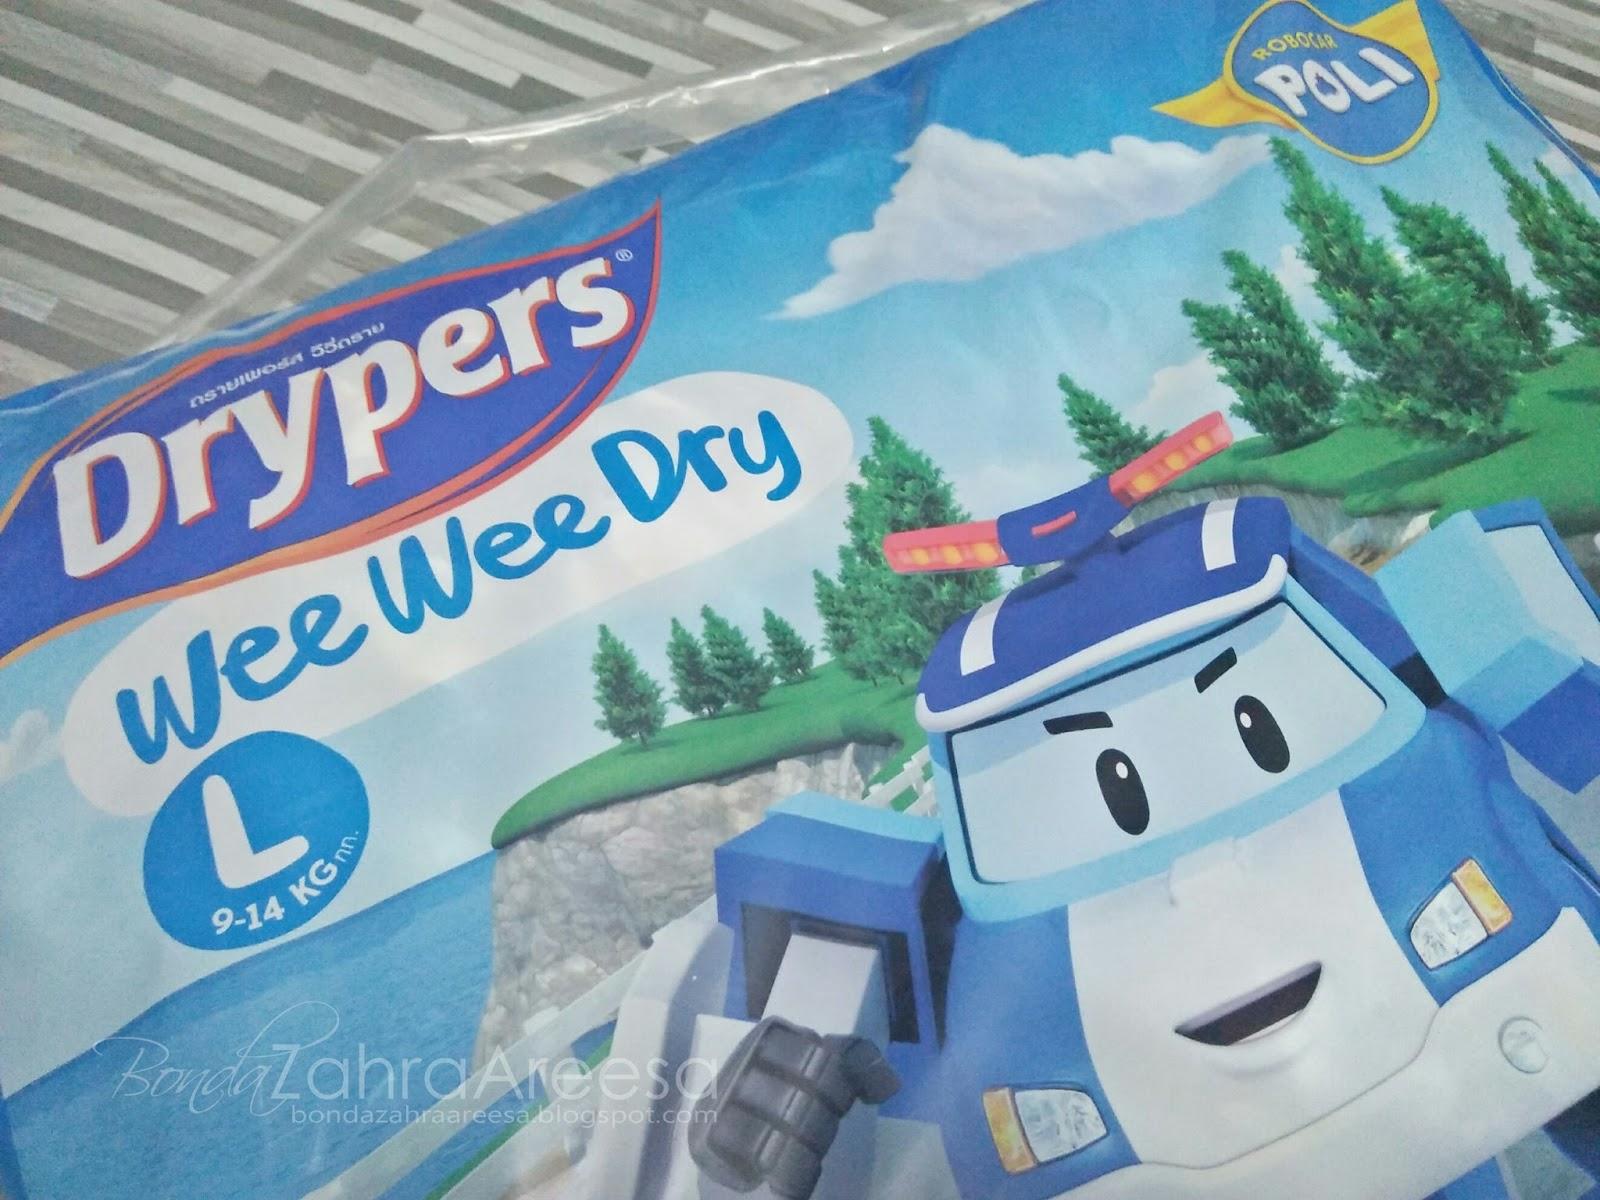 Review Pampers Wee Wee Dry, Review Pampers Untuk Anak